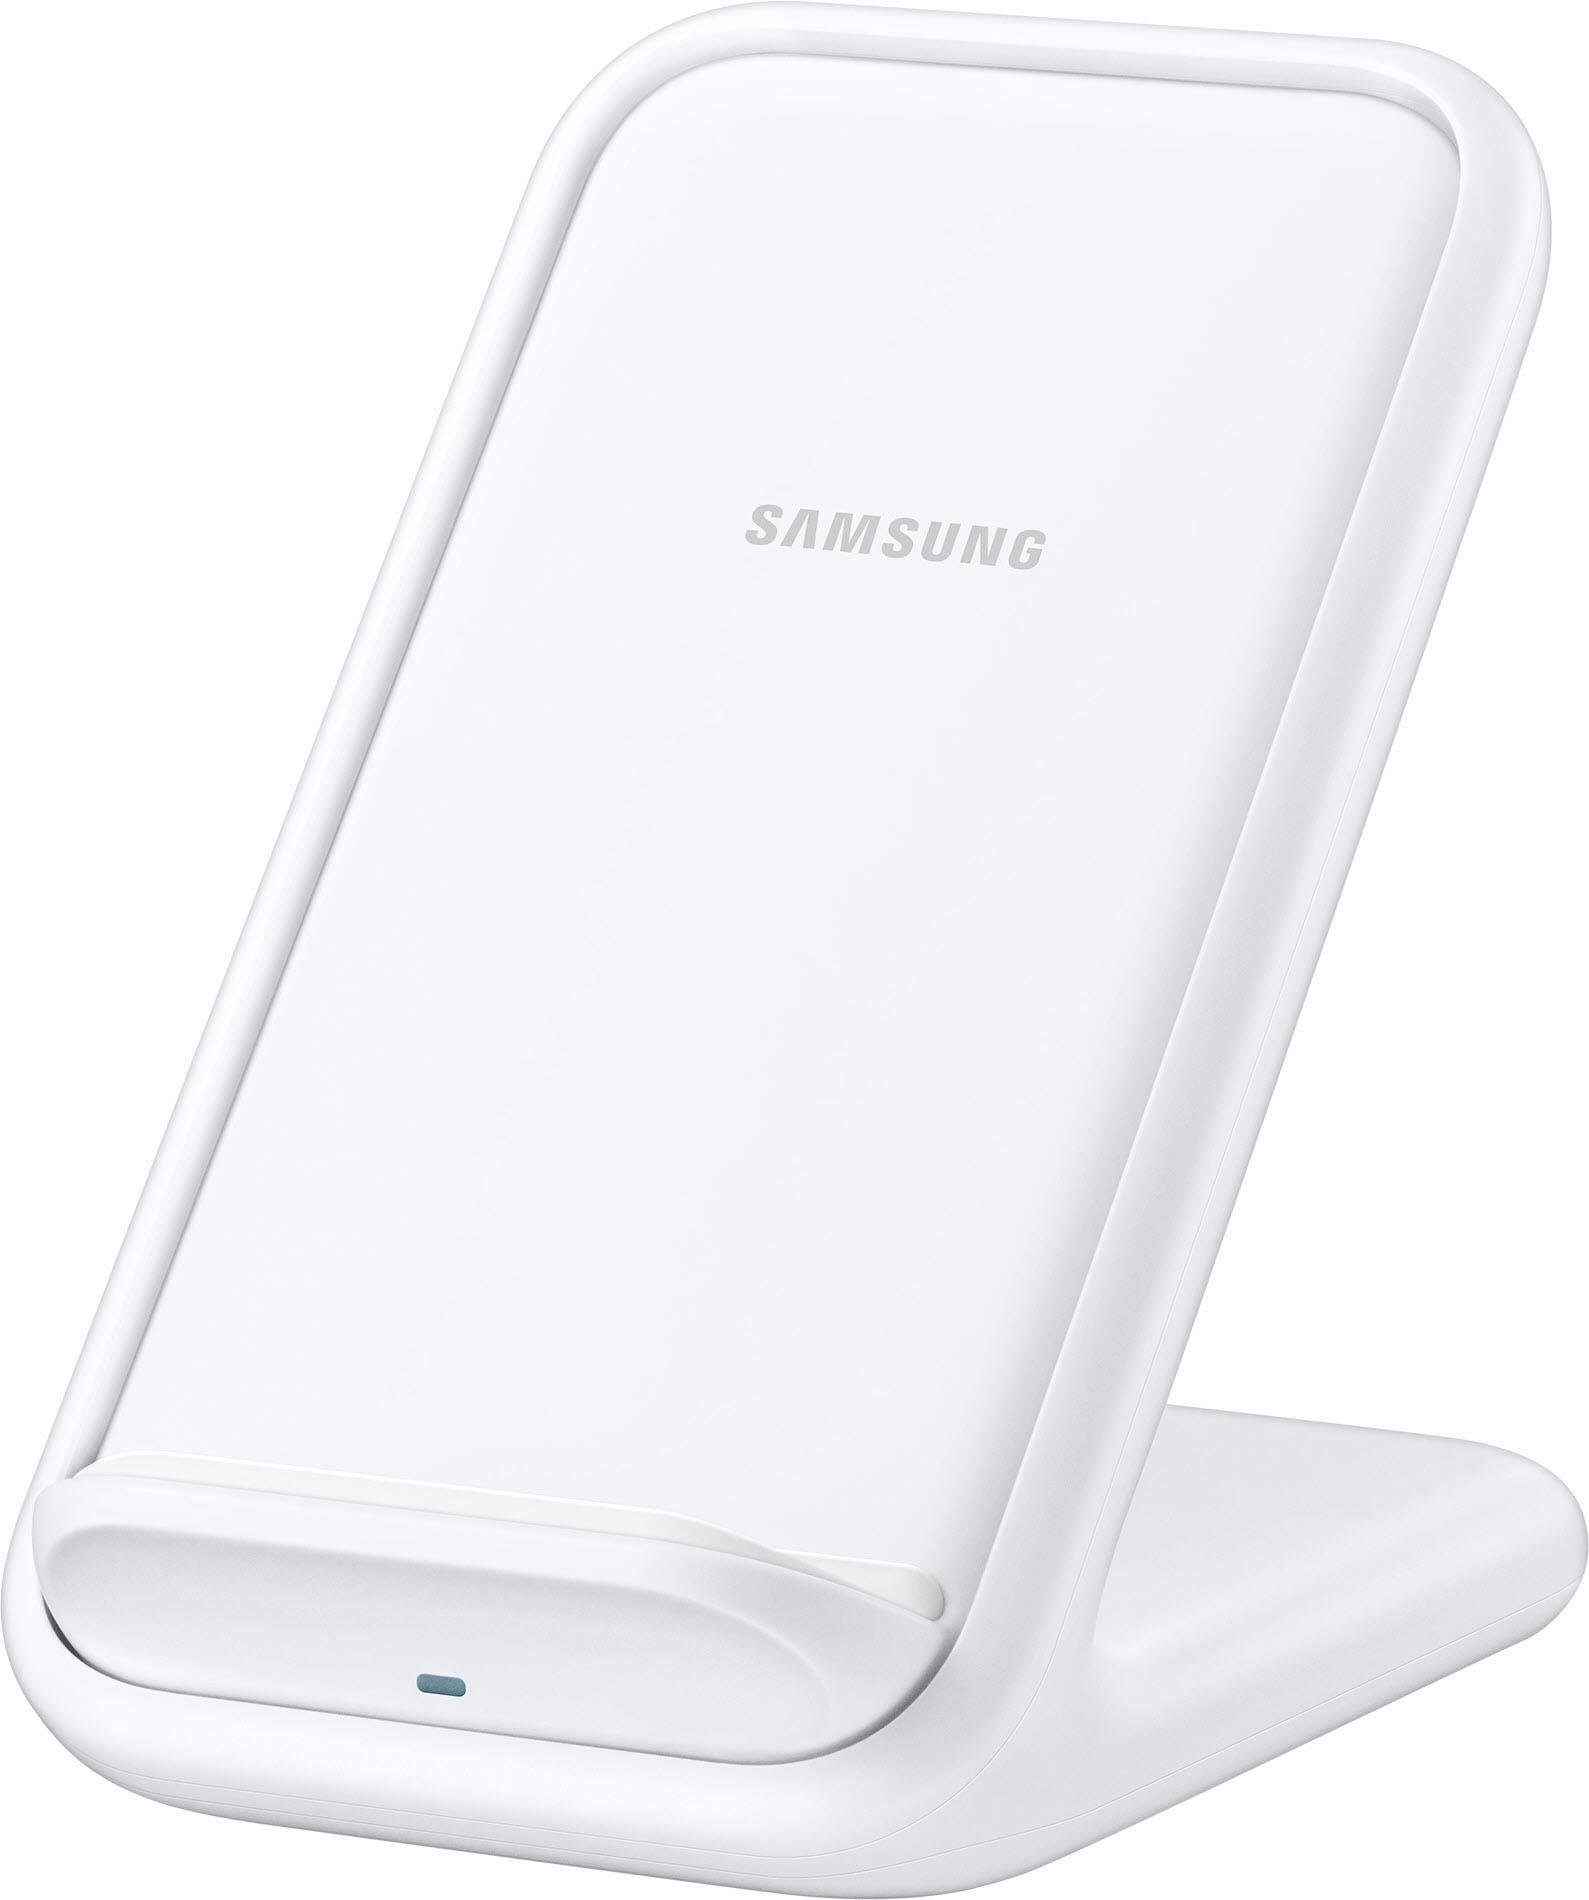 SAMSUNG »EP-N5200« inductieoplader online kopen op otto.nl